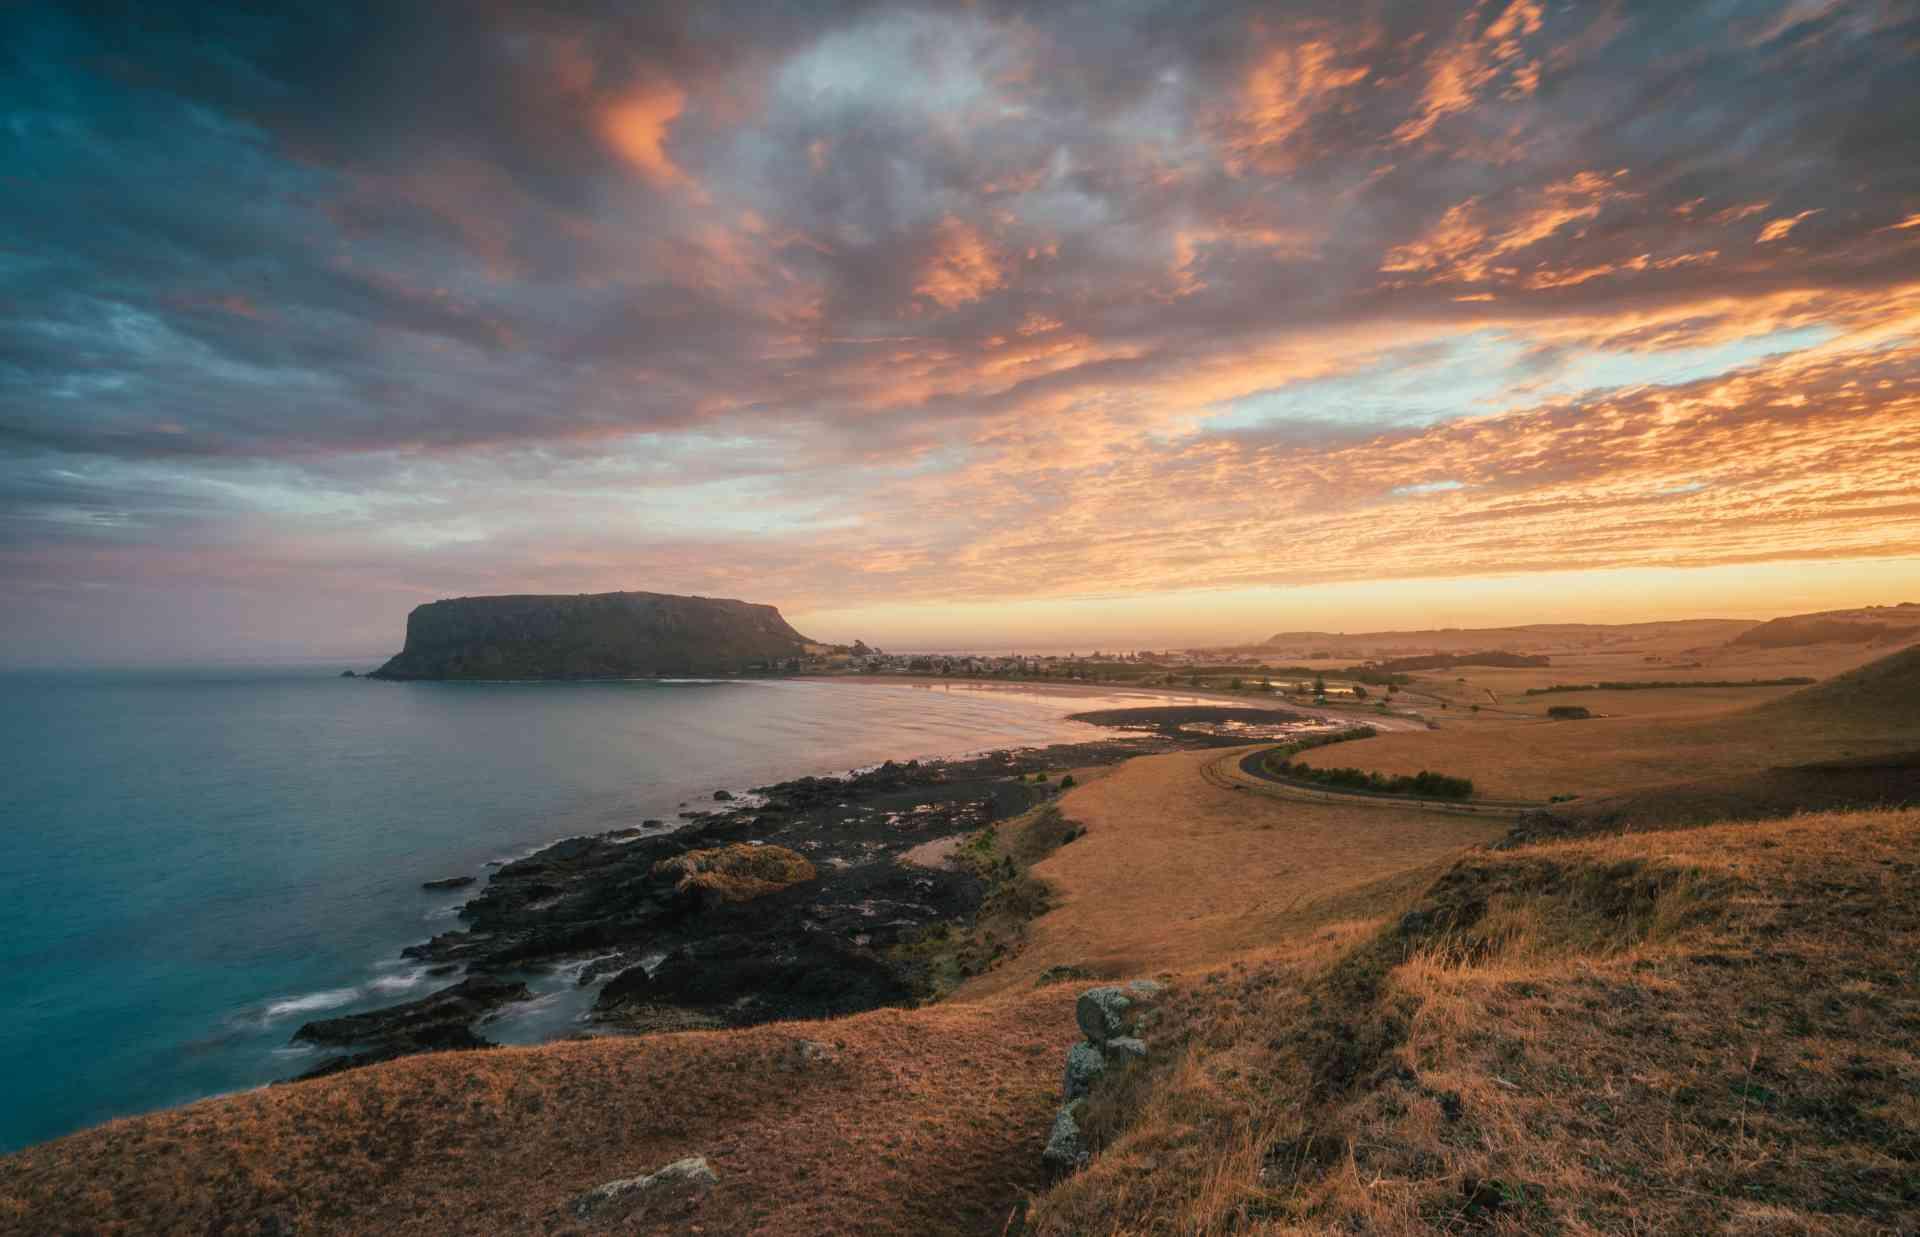 The Nut, Stanley, Tasmania by Tourism Tasmania and Jason Charles Hill